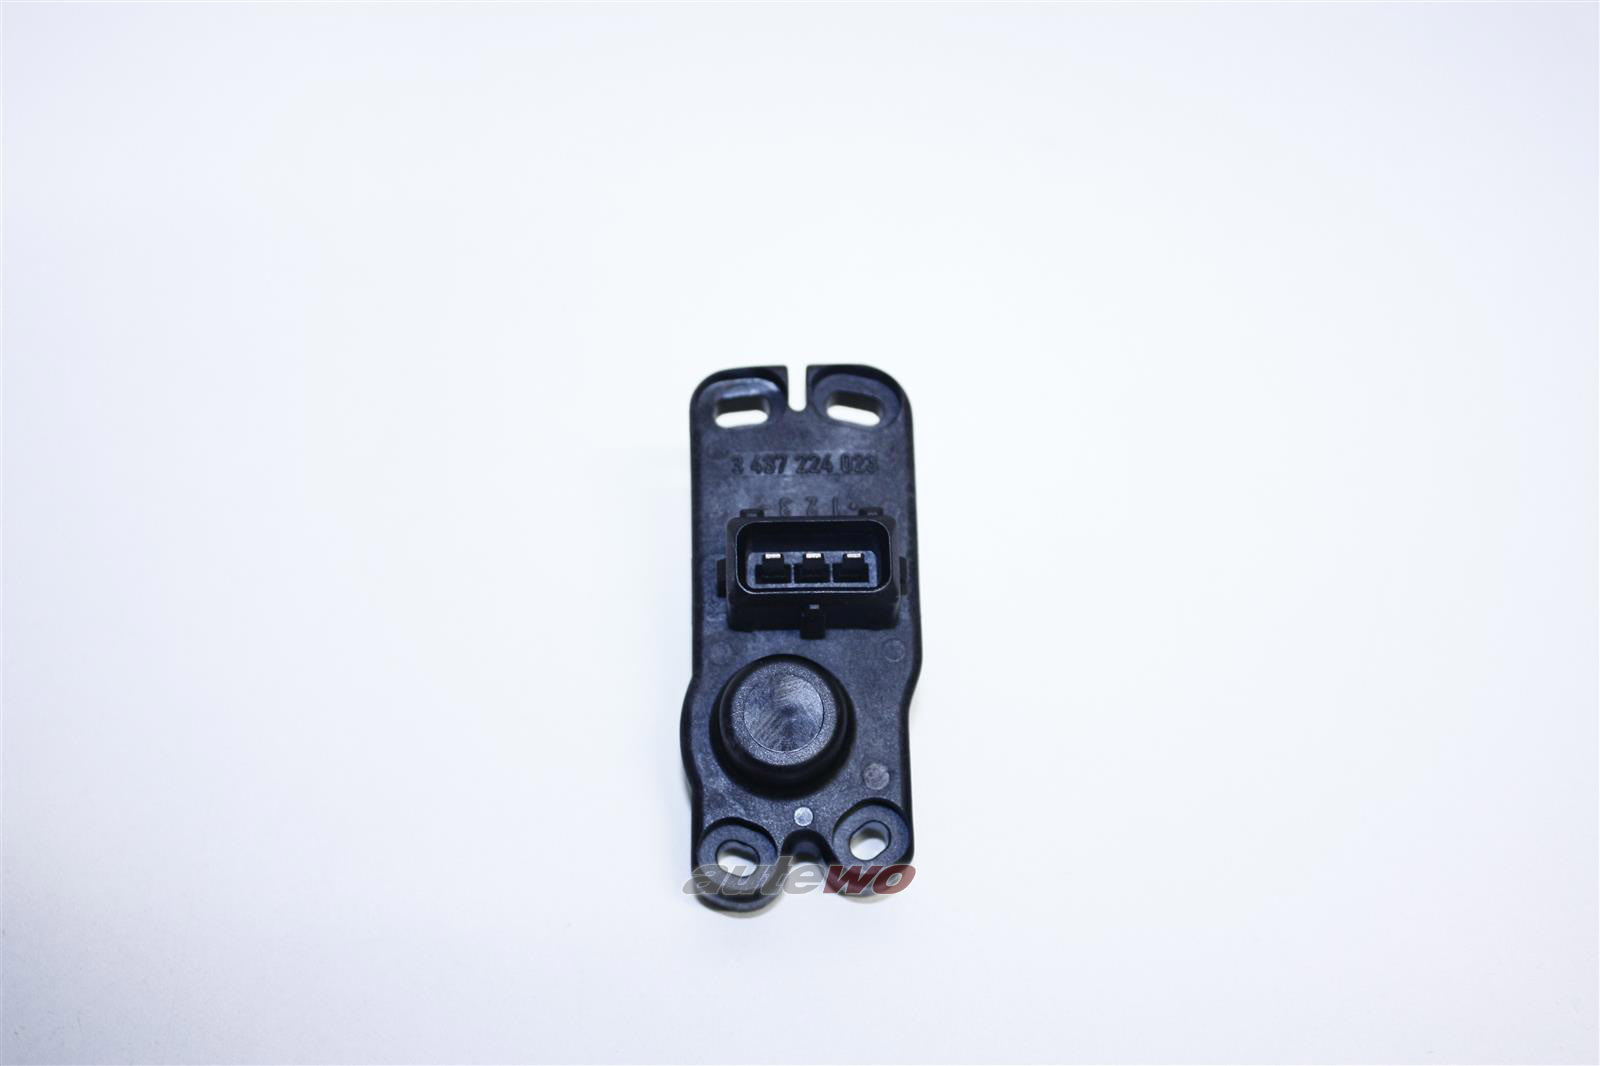 035133472B 03437224023 Audi/VW 90 81/85/100/200 44/Urquattro Luftmengenmesser Potentiometer Bordcomputer